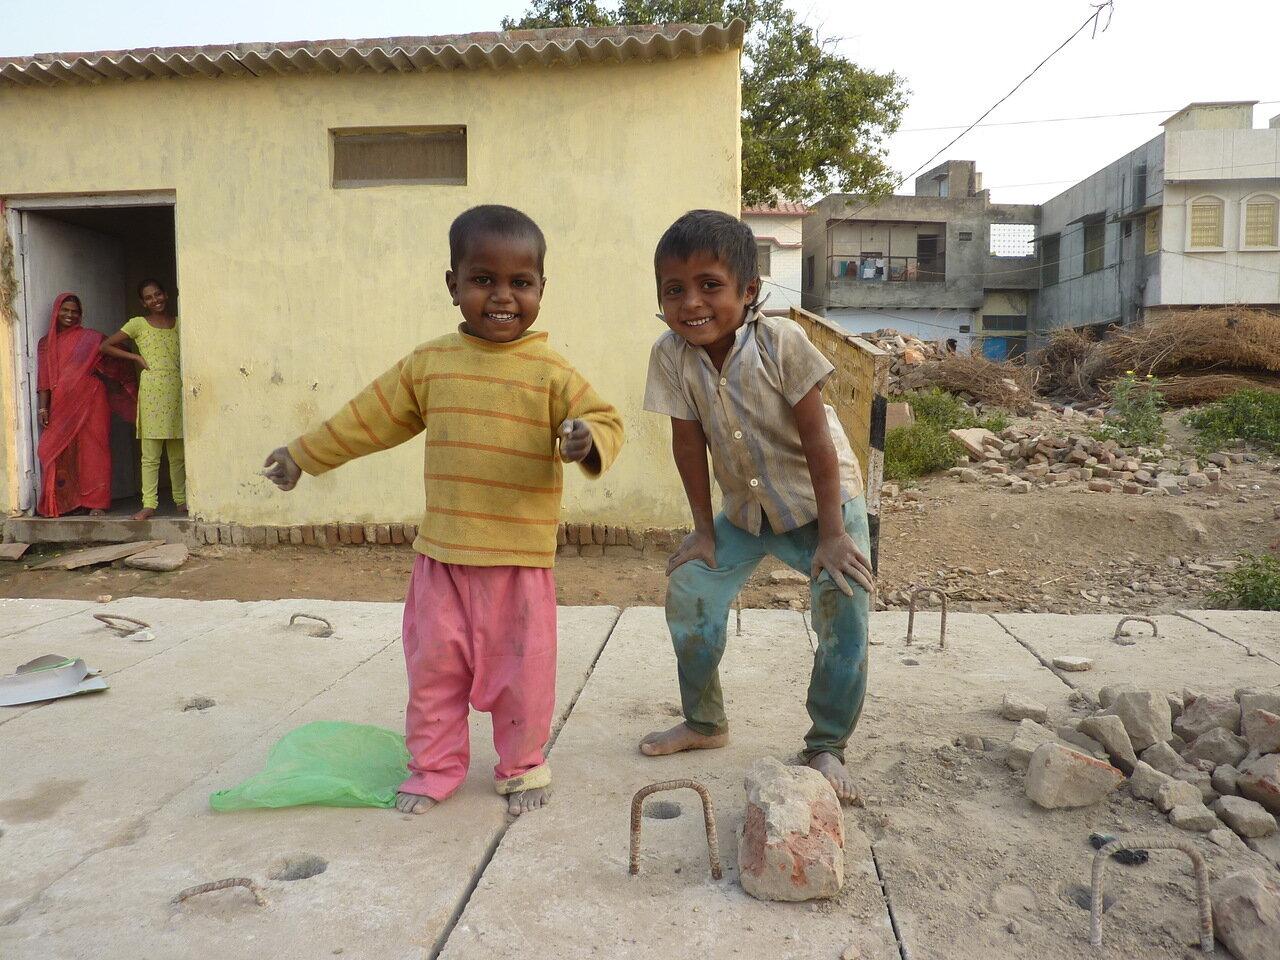 Дети Вриндавана - люди Вриндавана называются бриджабаси